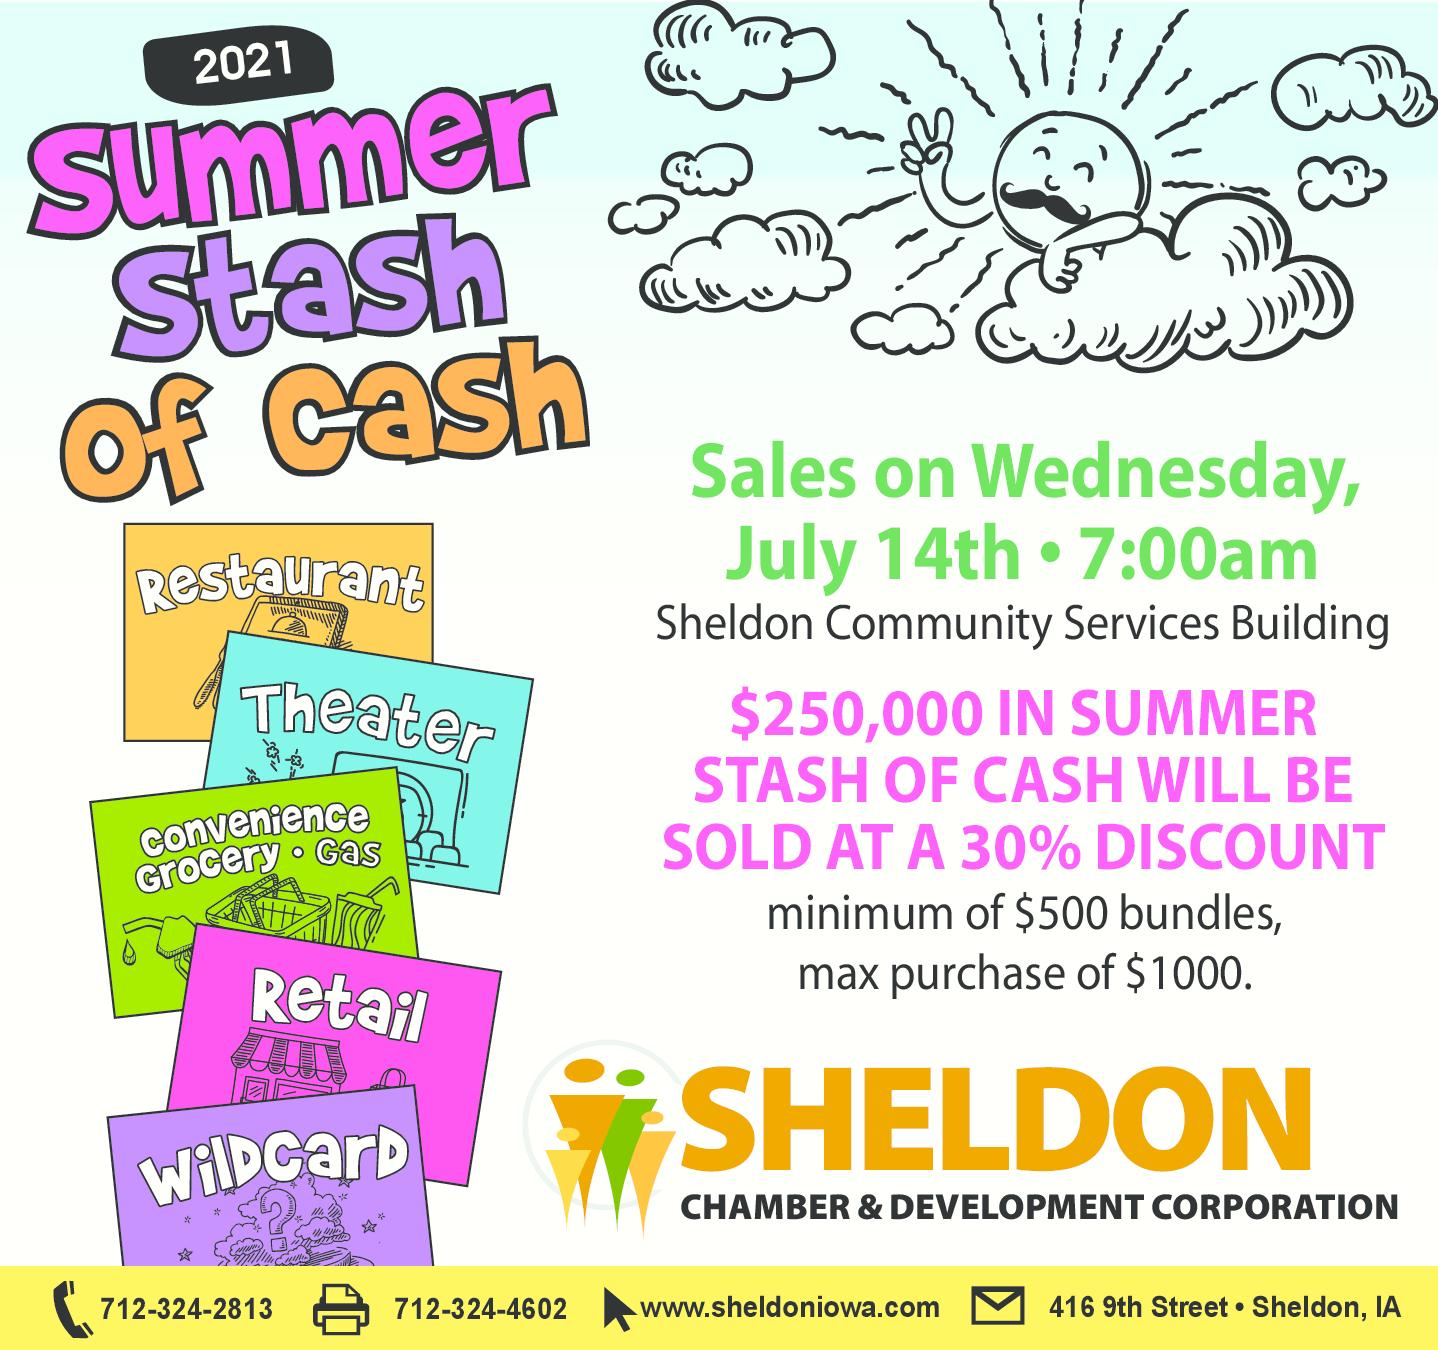 Summer Stash of Cash